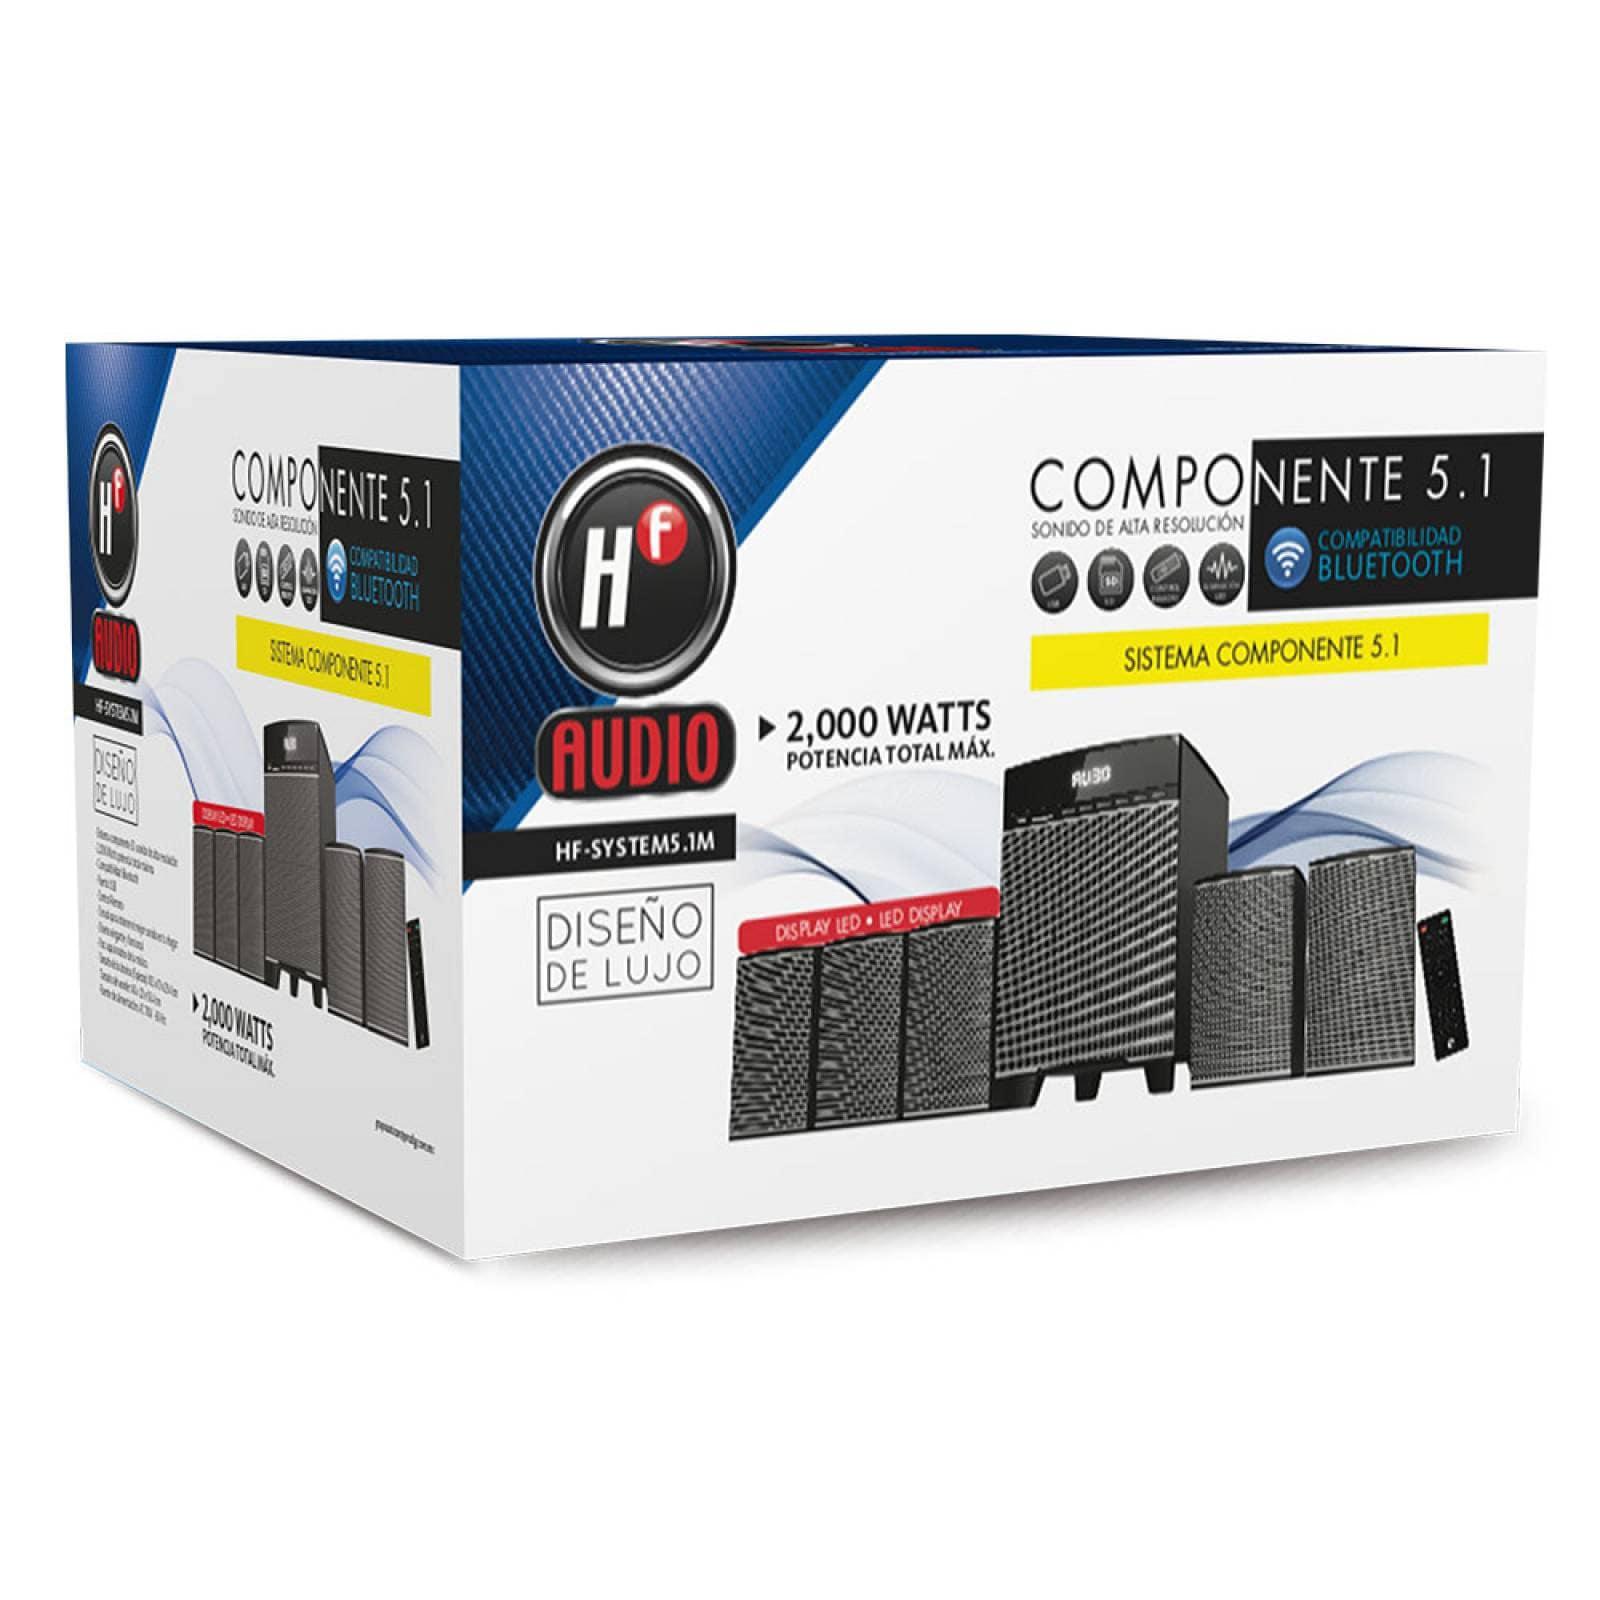 Componente Bluetooth 5 Bocinas Hf-system5.1m 2000 Watts Usb